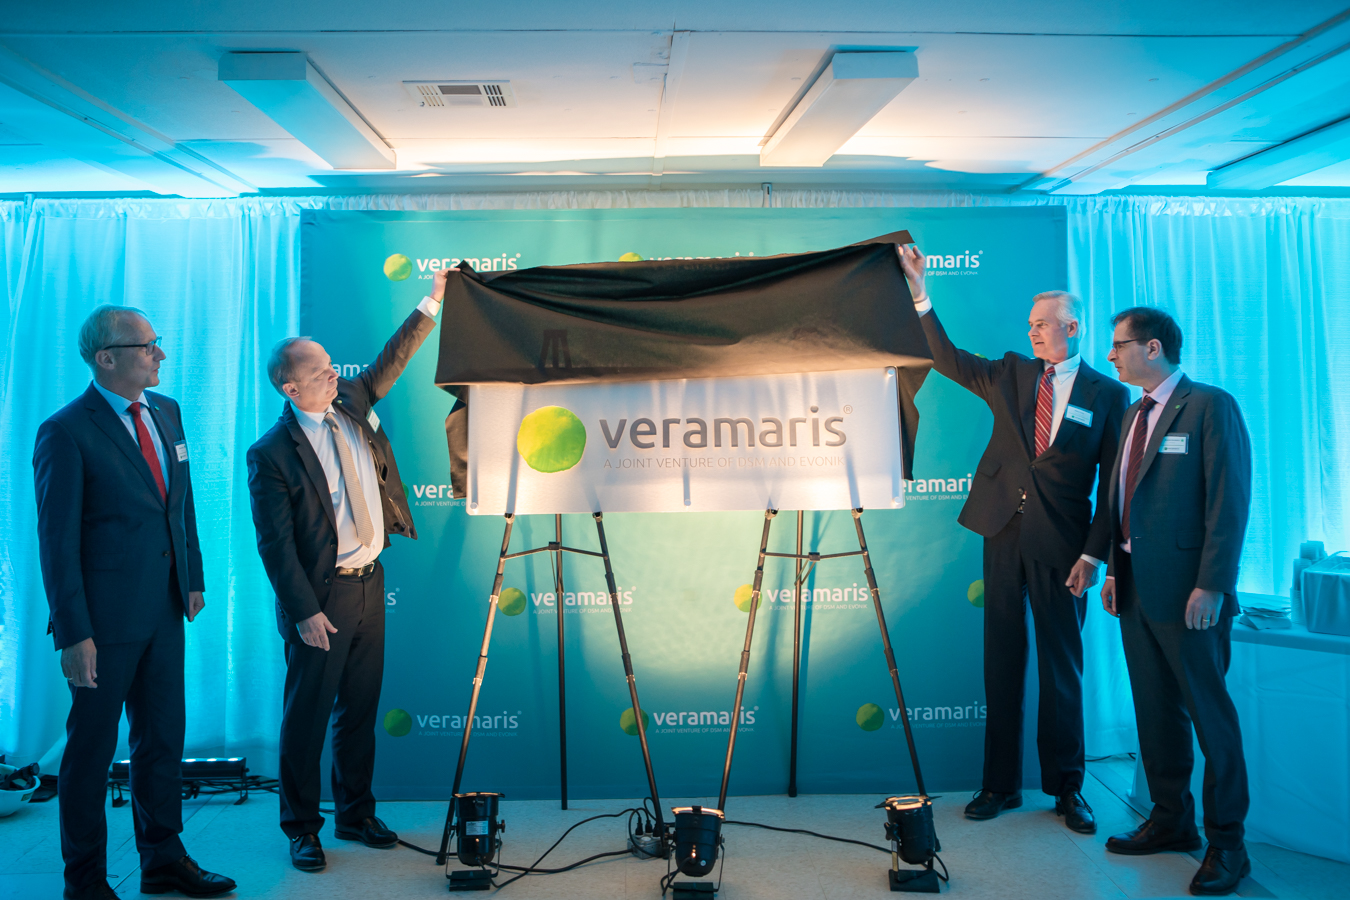 Half-time for Veramaris' algal oil production facility in